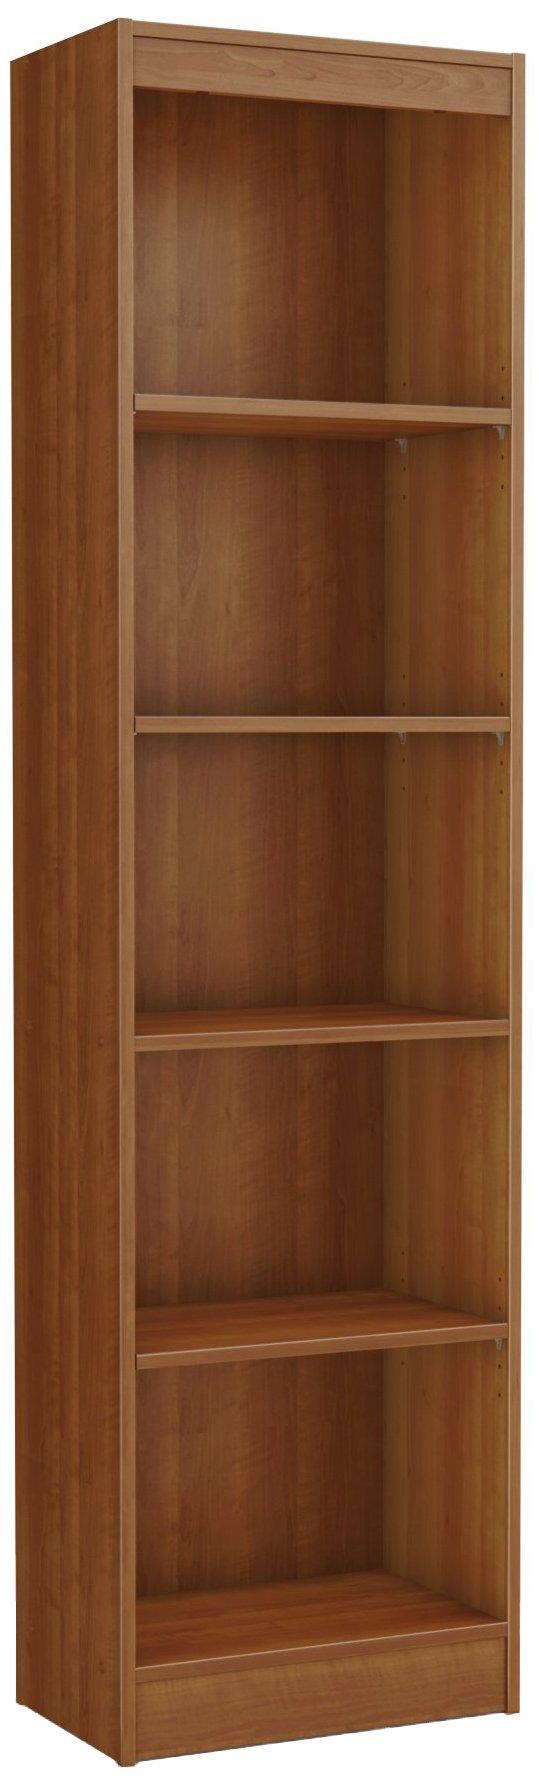 South Shore Narrow 5-Shelf Storage Bookcase, Morgan Cherry by South Shore